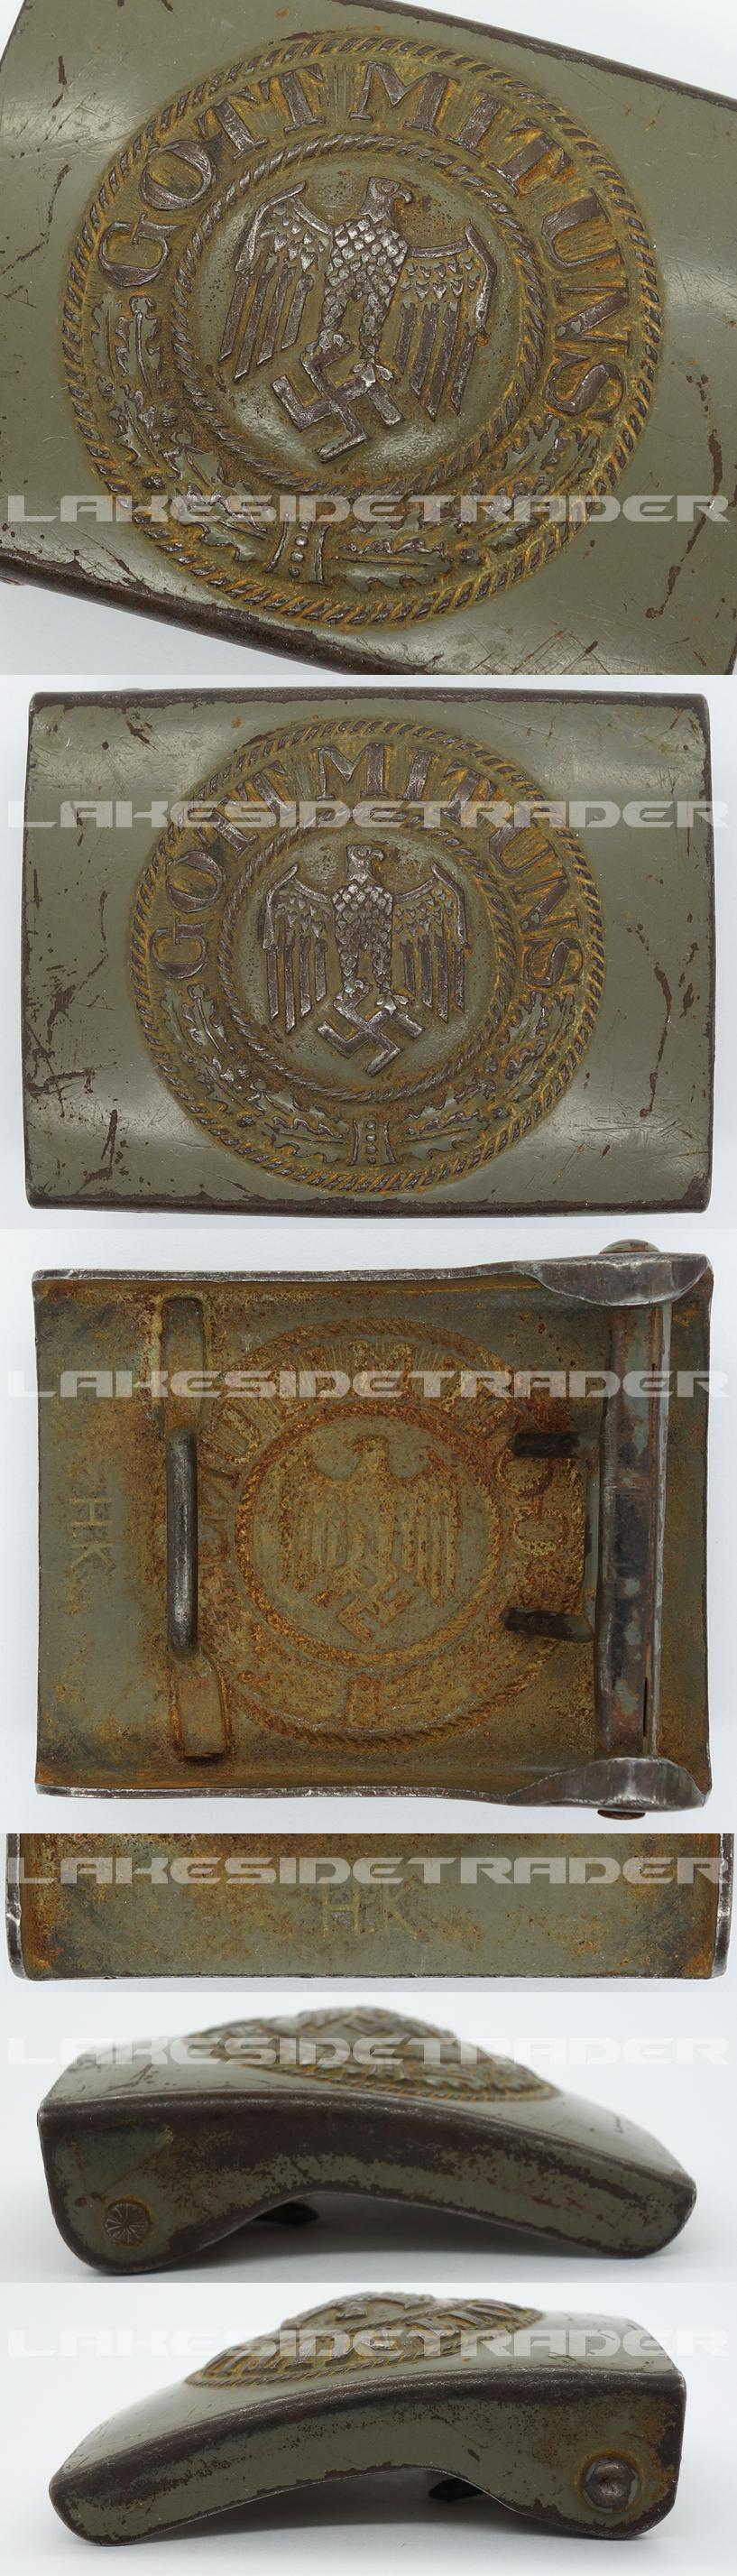 Army Belt Buckle by H.K.